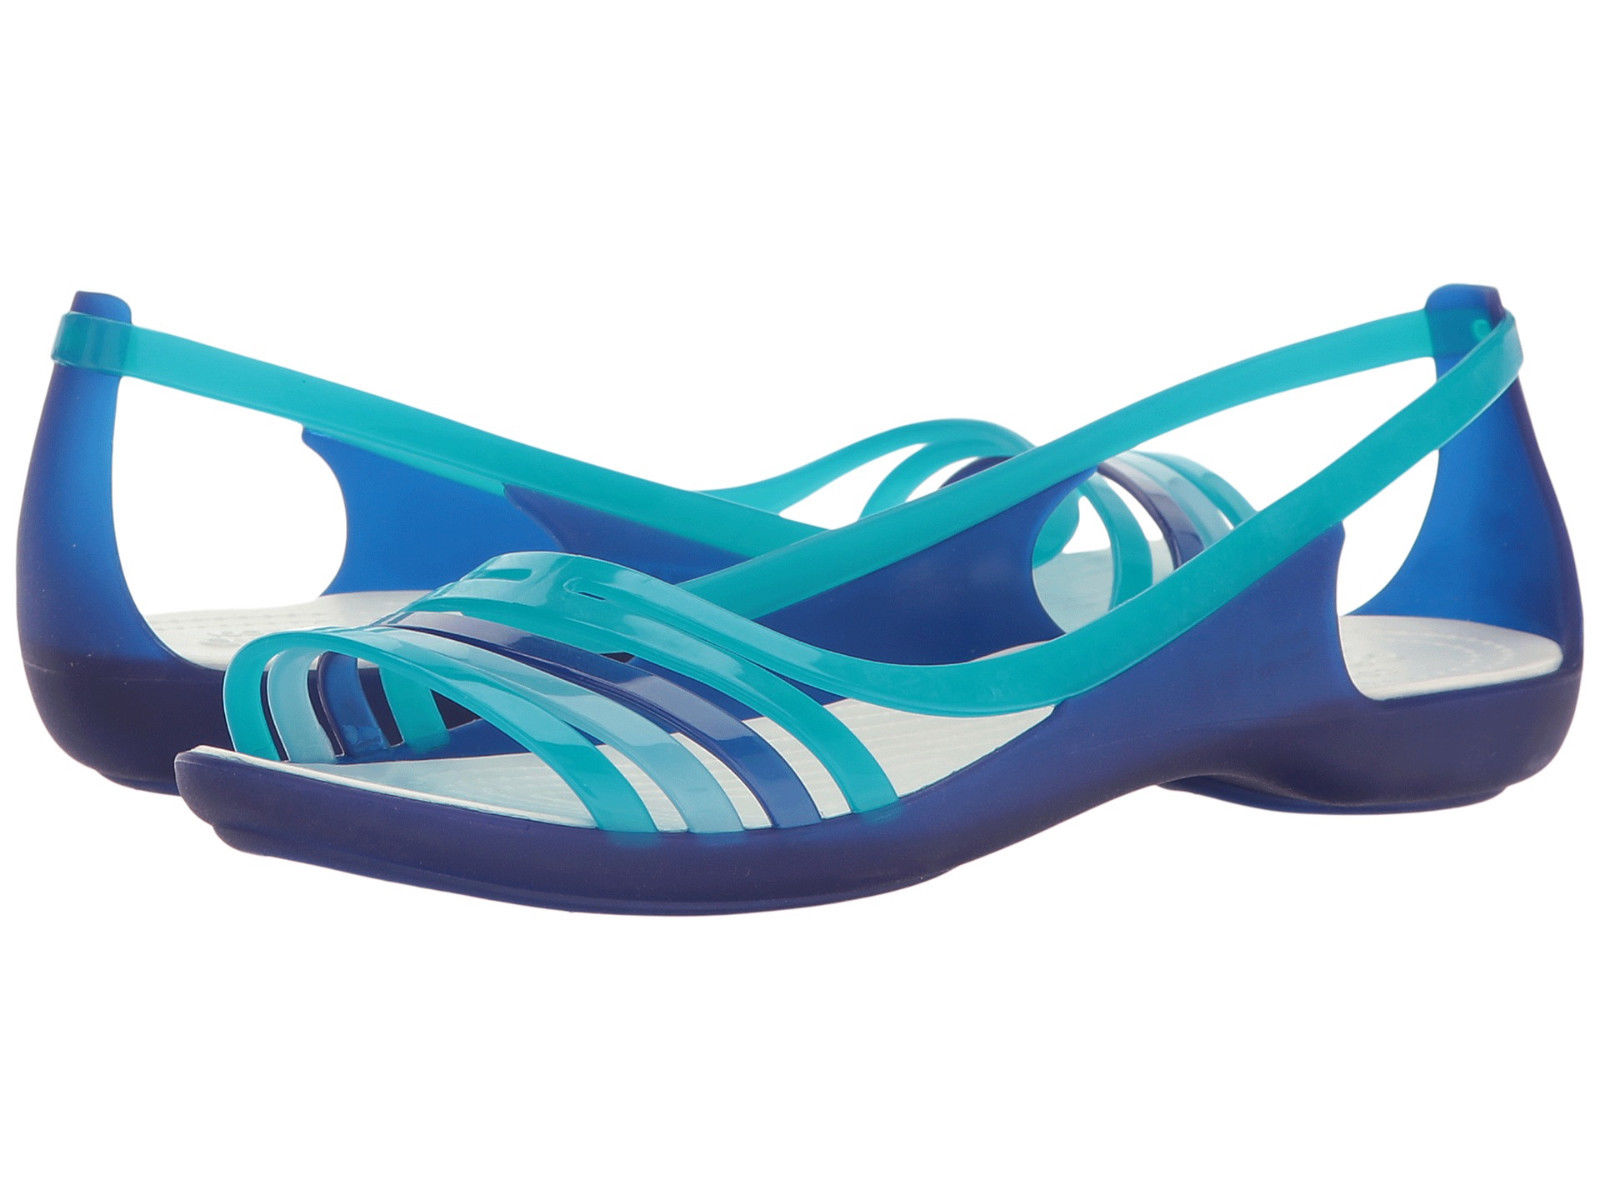 c767ef9d8 ... sandały Crocs Isabella Huarache Flat W Cerulean Blue 202463-4O7